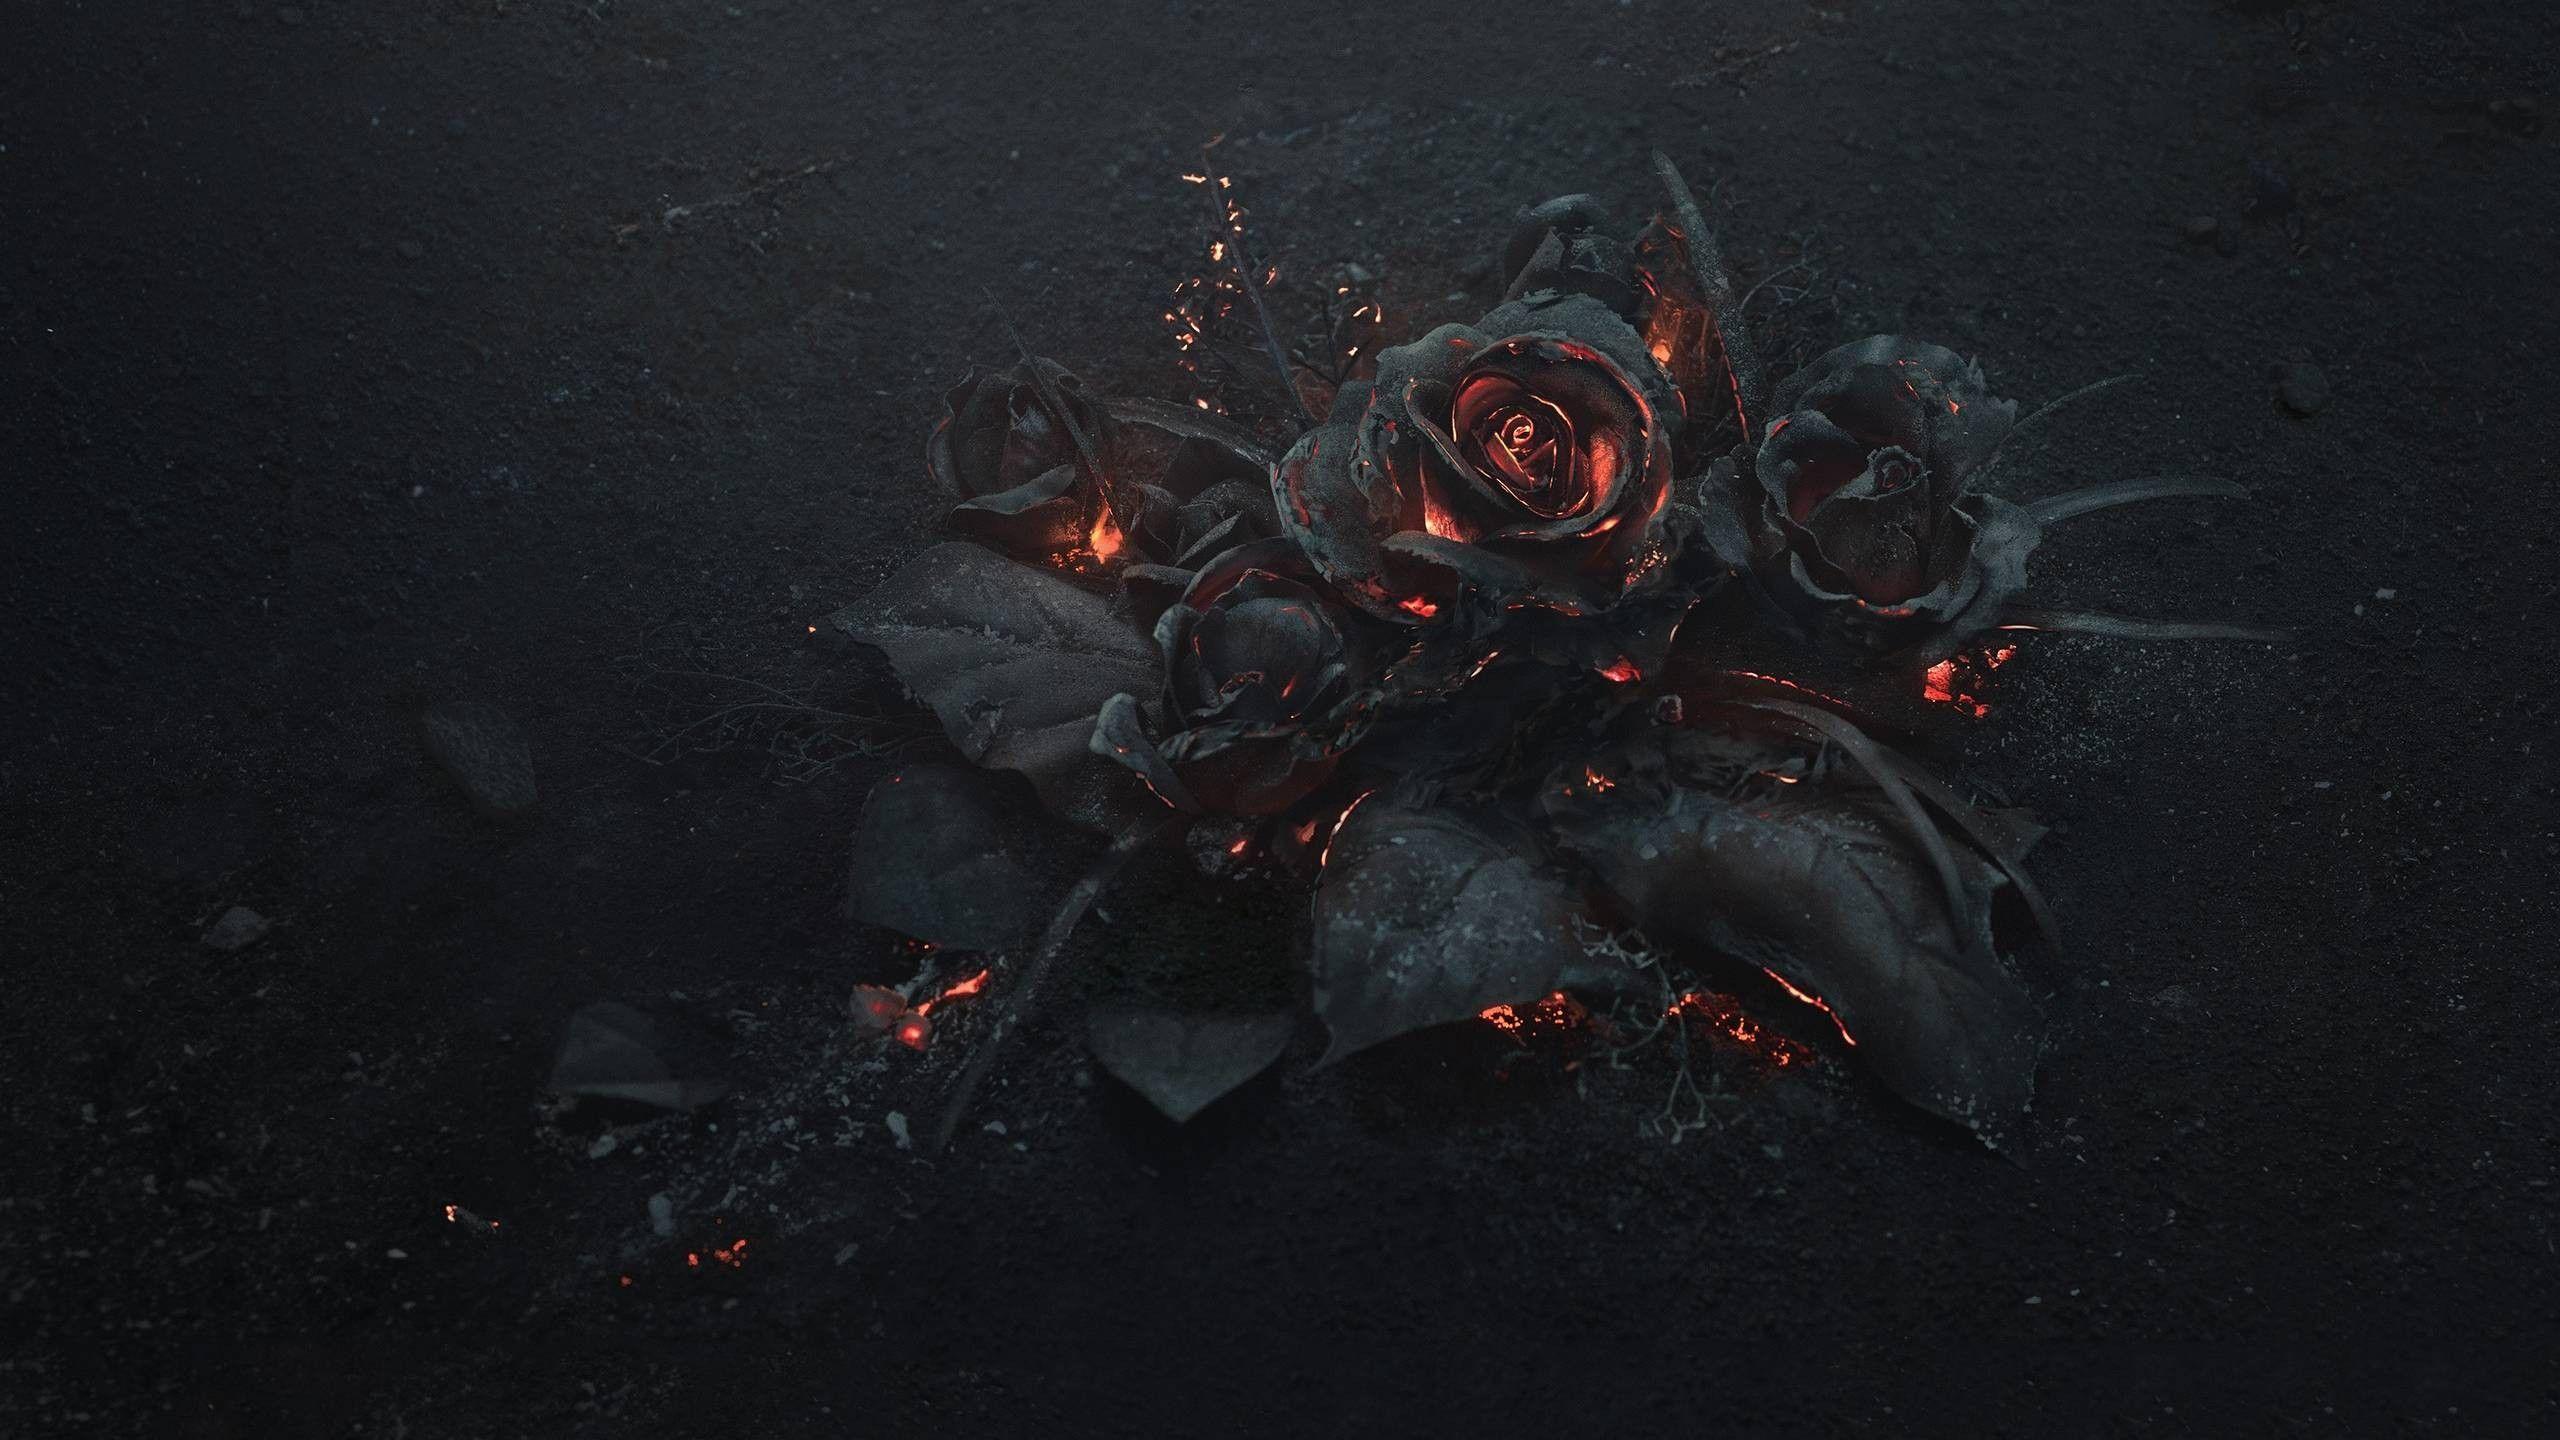 Mobili gotici ~ Fiori rosa fuoco gotici dark goth style gothic